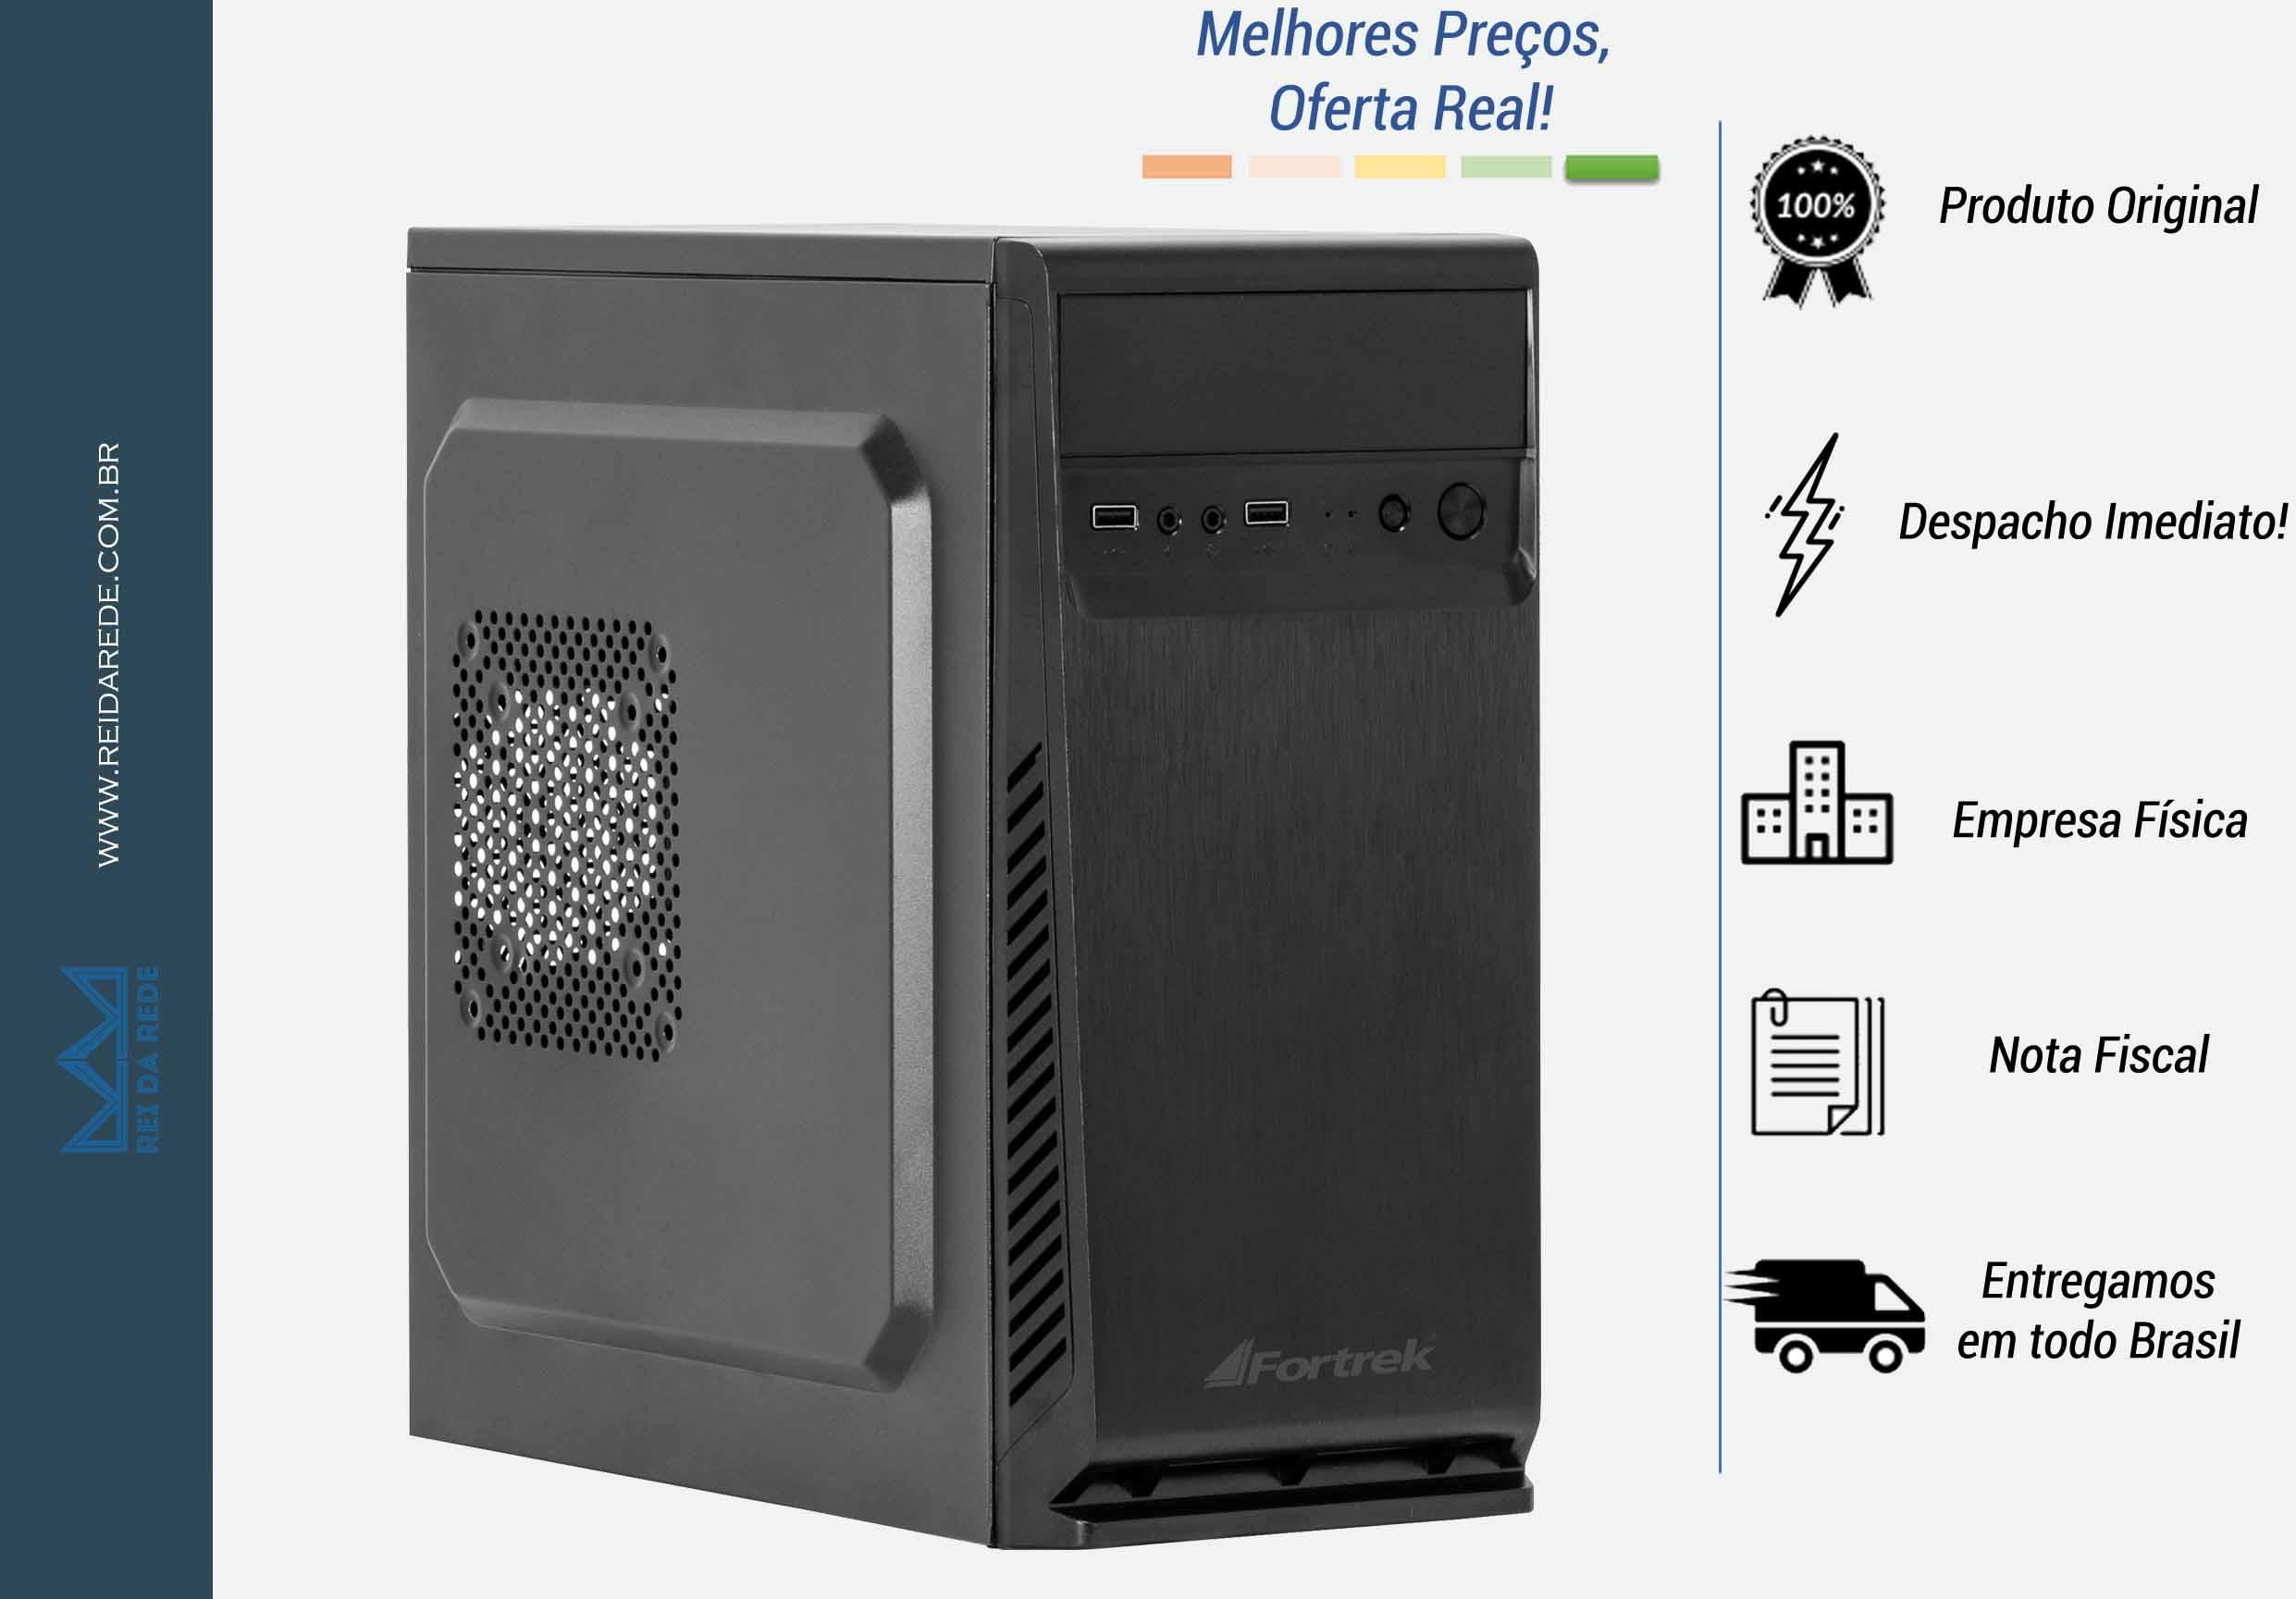 GABINETE ATX FORTREK SC501BK PRETO SEM FONTE - MARCA: FORTREK - MODELO: SC501BK